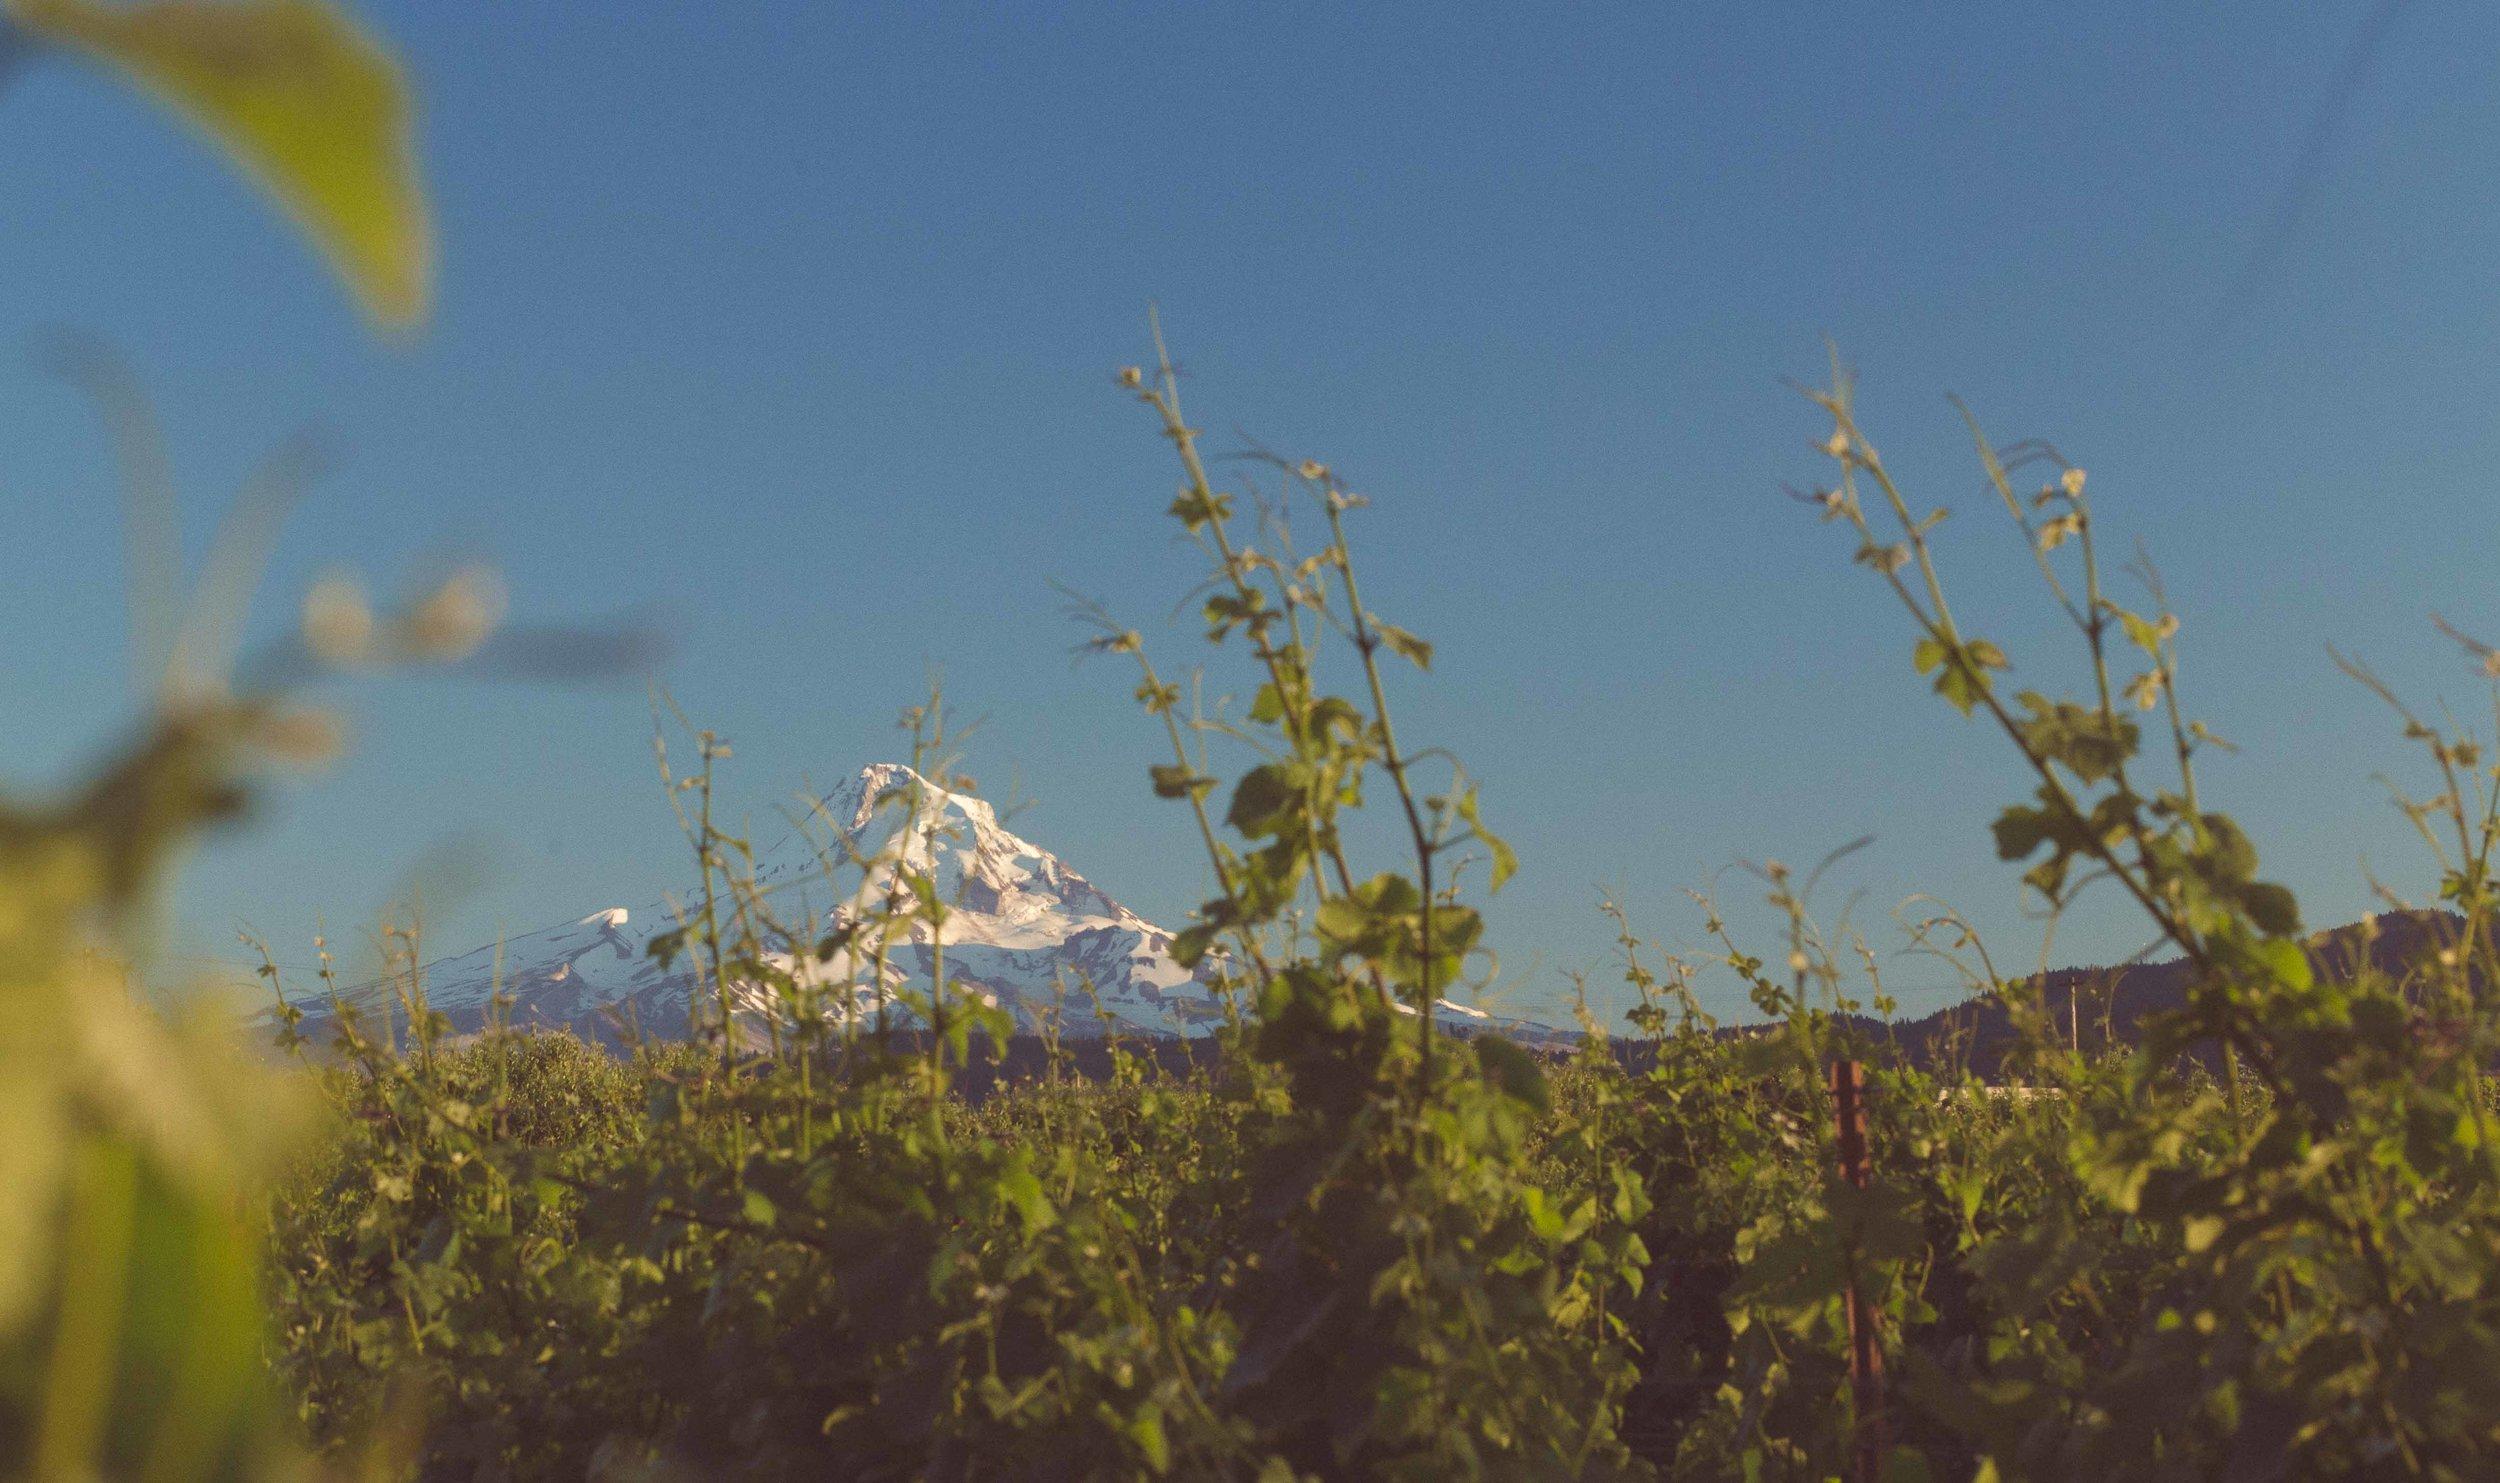 Hood River Wine Alliance Columbia Gorge Wine Mt.Hood Vinyards things to do vacation beautiful scenic fruit loop wine_-7.jpg